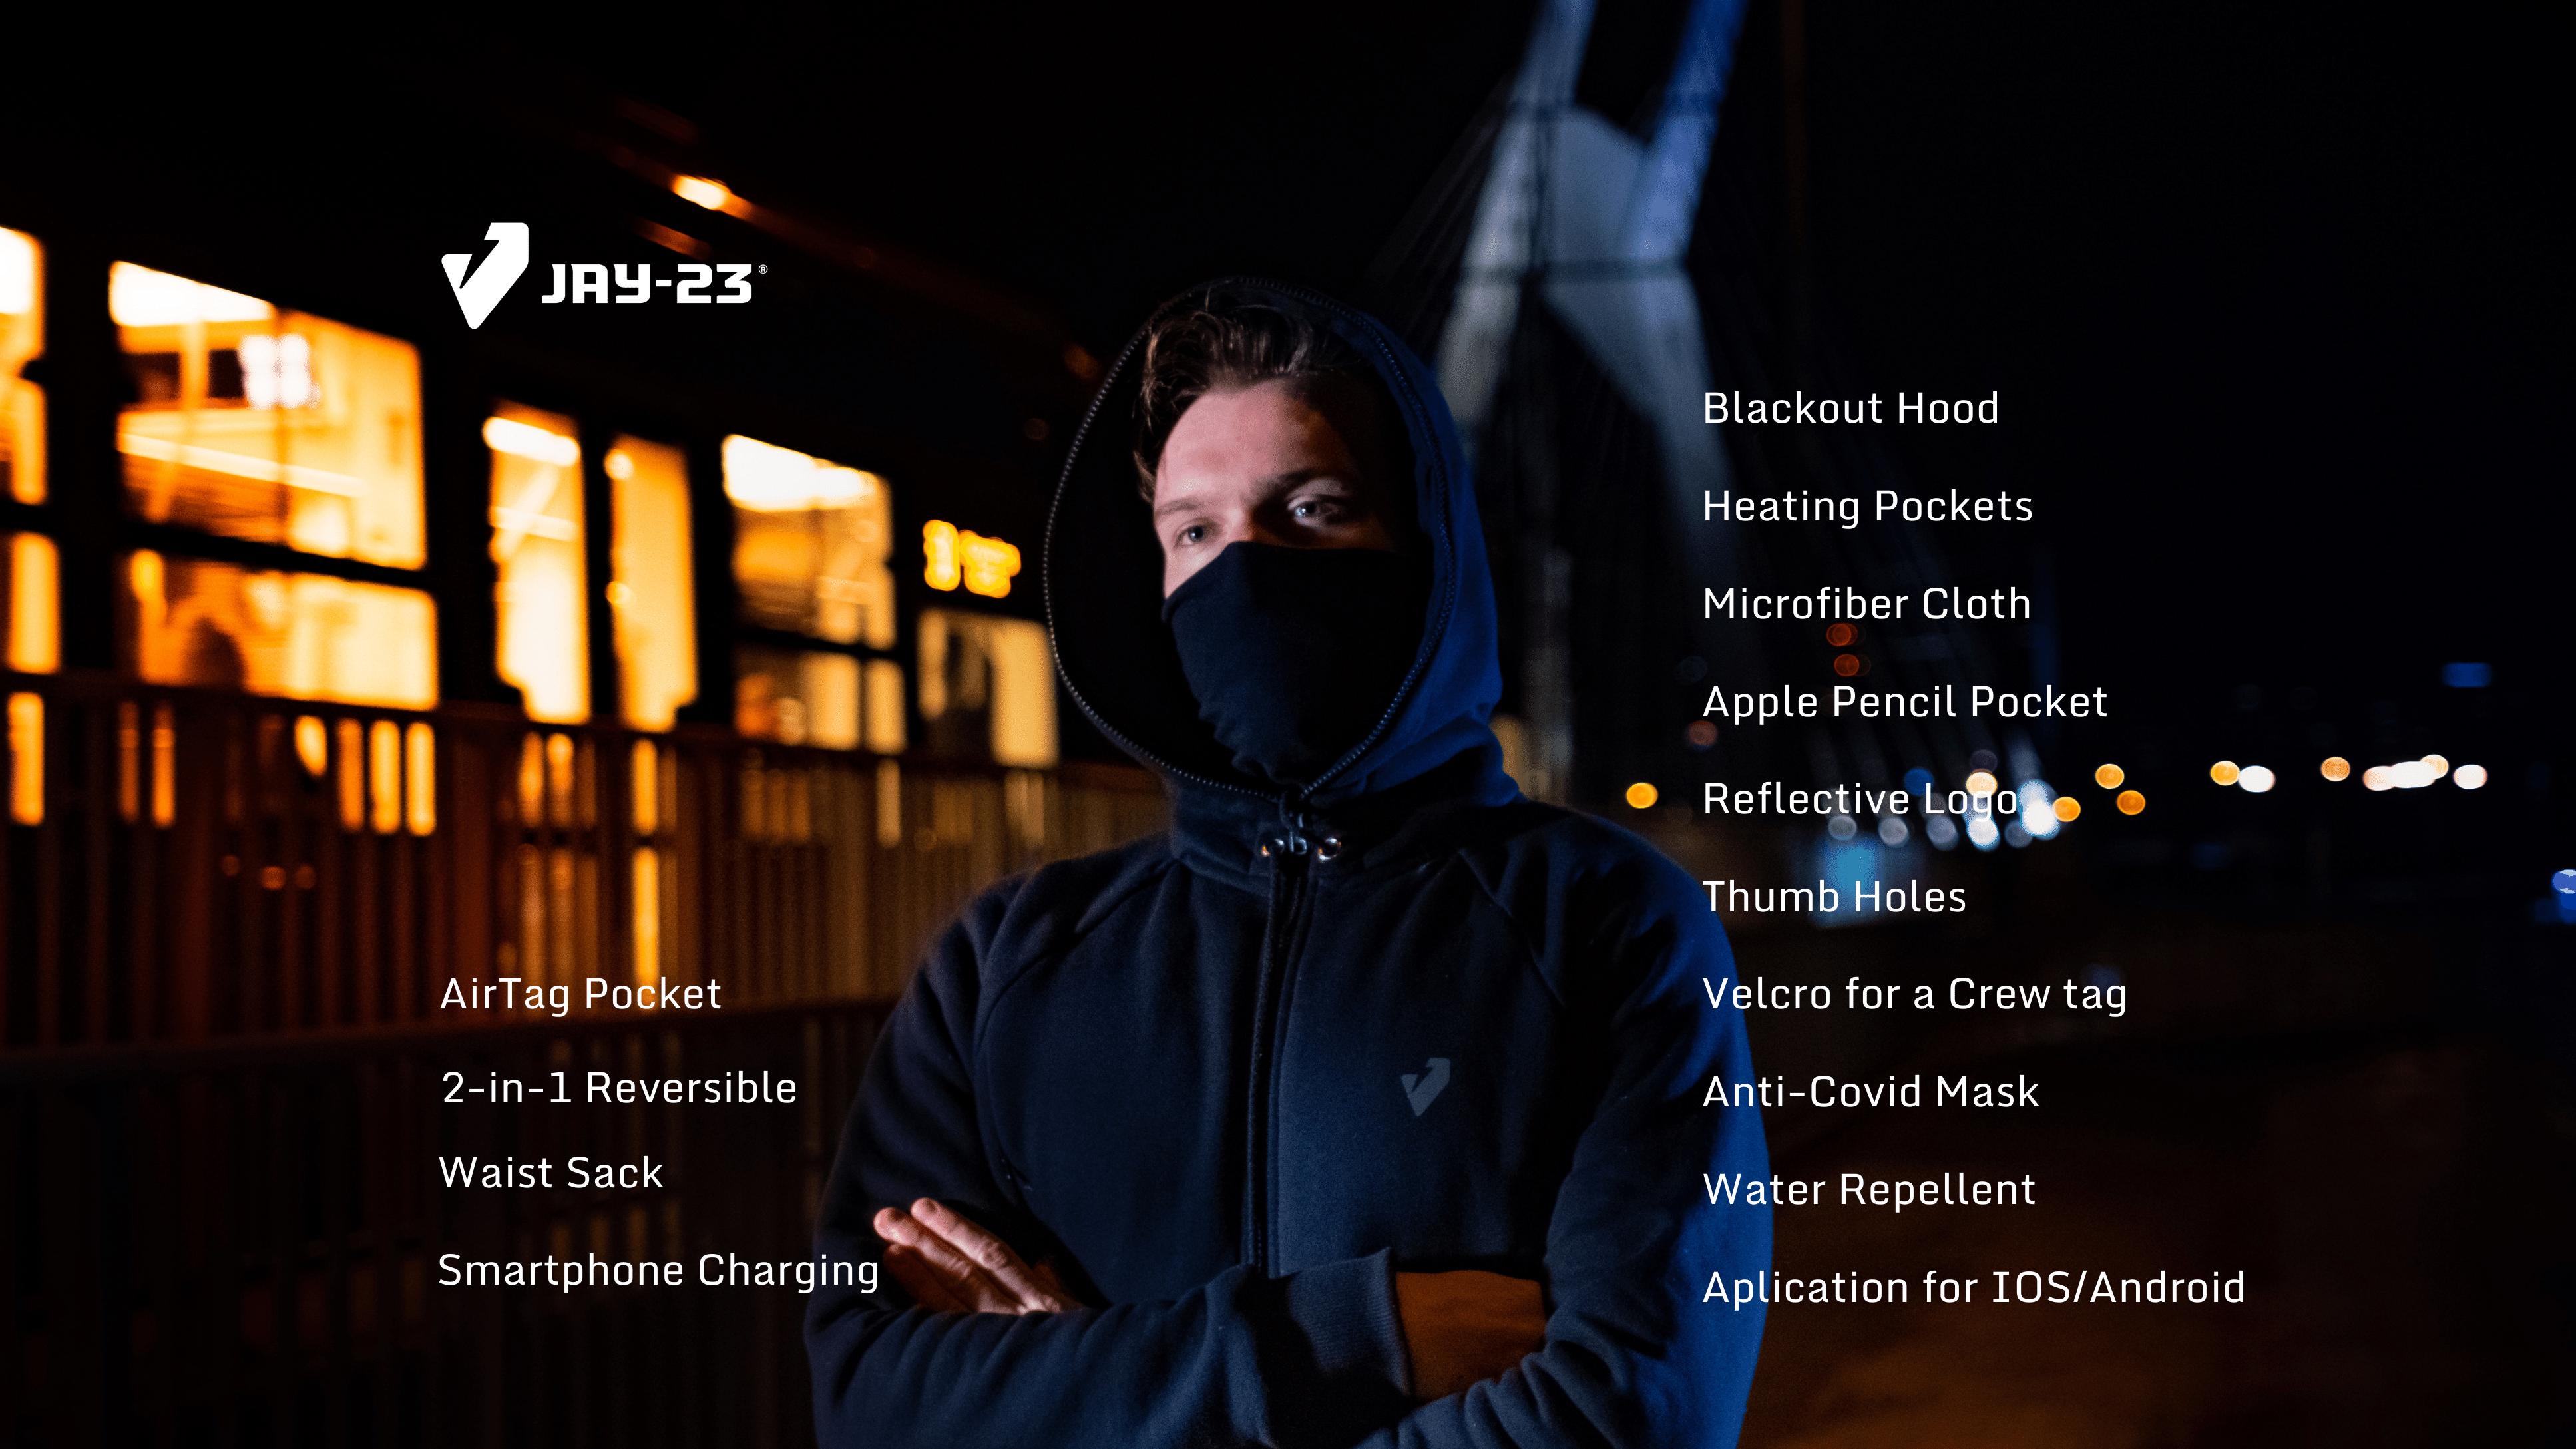 Jay23 PRO heated smart jacket 2021